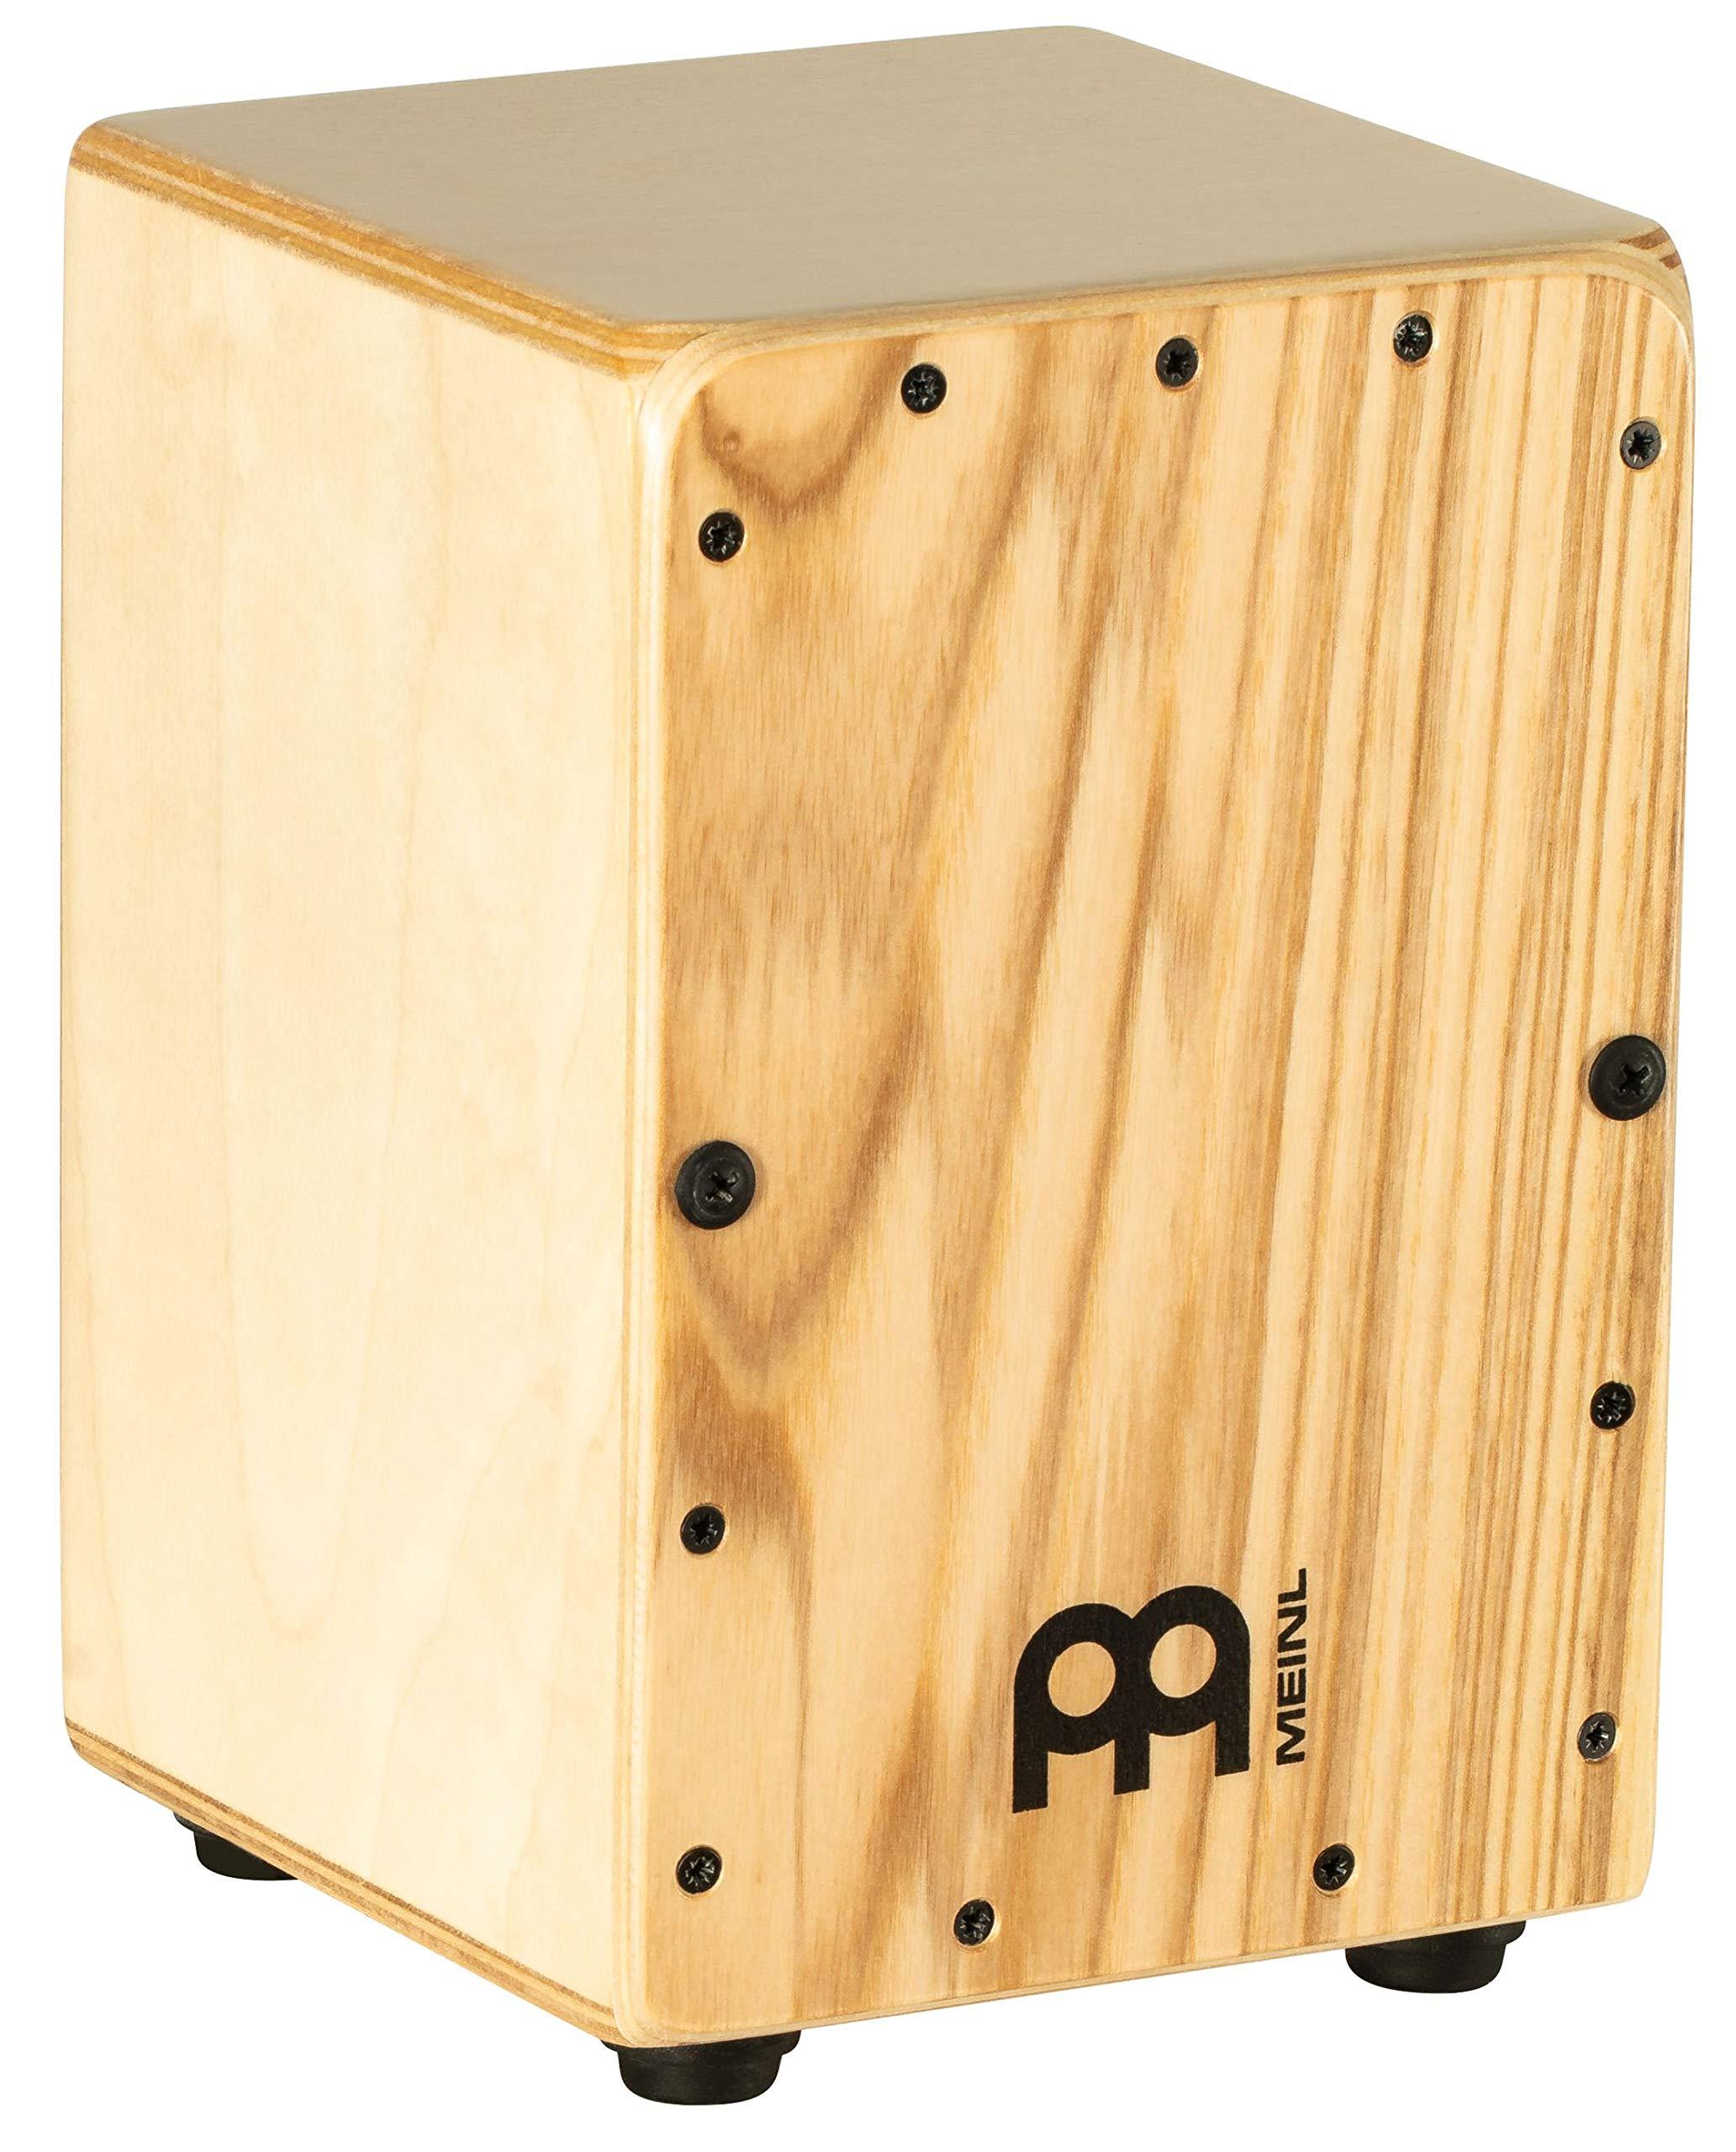 Meinl Mini Cajon Box Drum with Internal Snares - MADE IN EUROPE - Heart Ash Frontplate / Baltic Birch Body, Miniature Size,  2-YEAR WARRANTY (MC1HA)